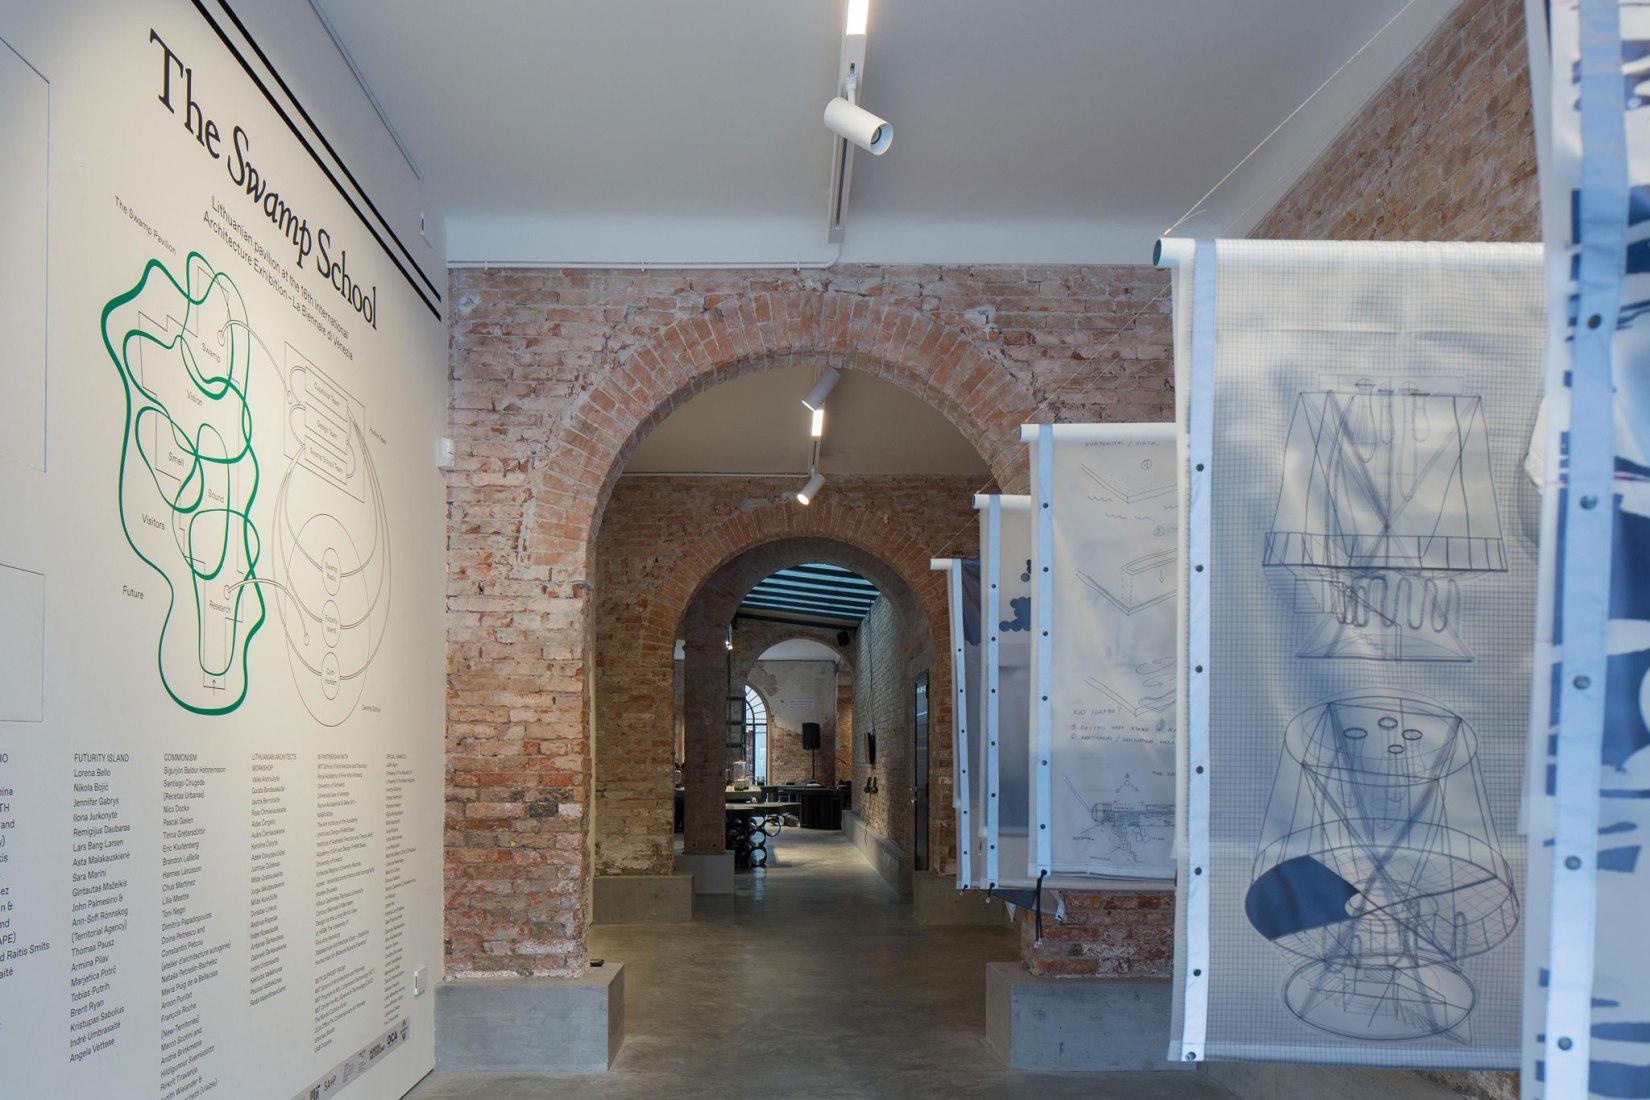 The Swamp Pavilion. Lithuanian Pavilion at the 16th Biennale Architettura di Venezia 2018. Photography by Norbert Tukaj